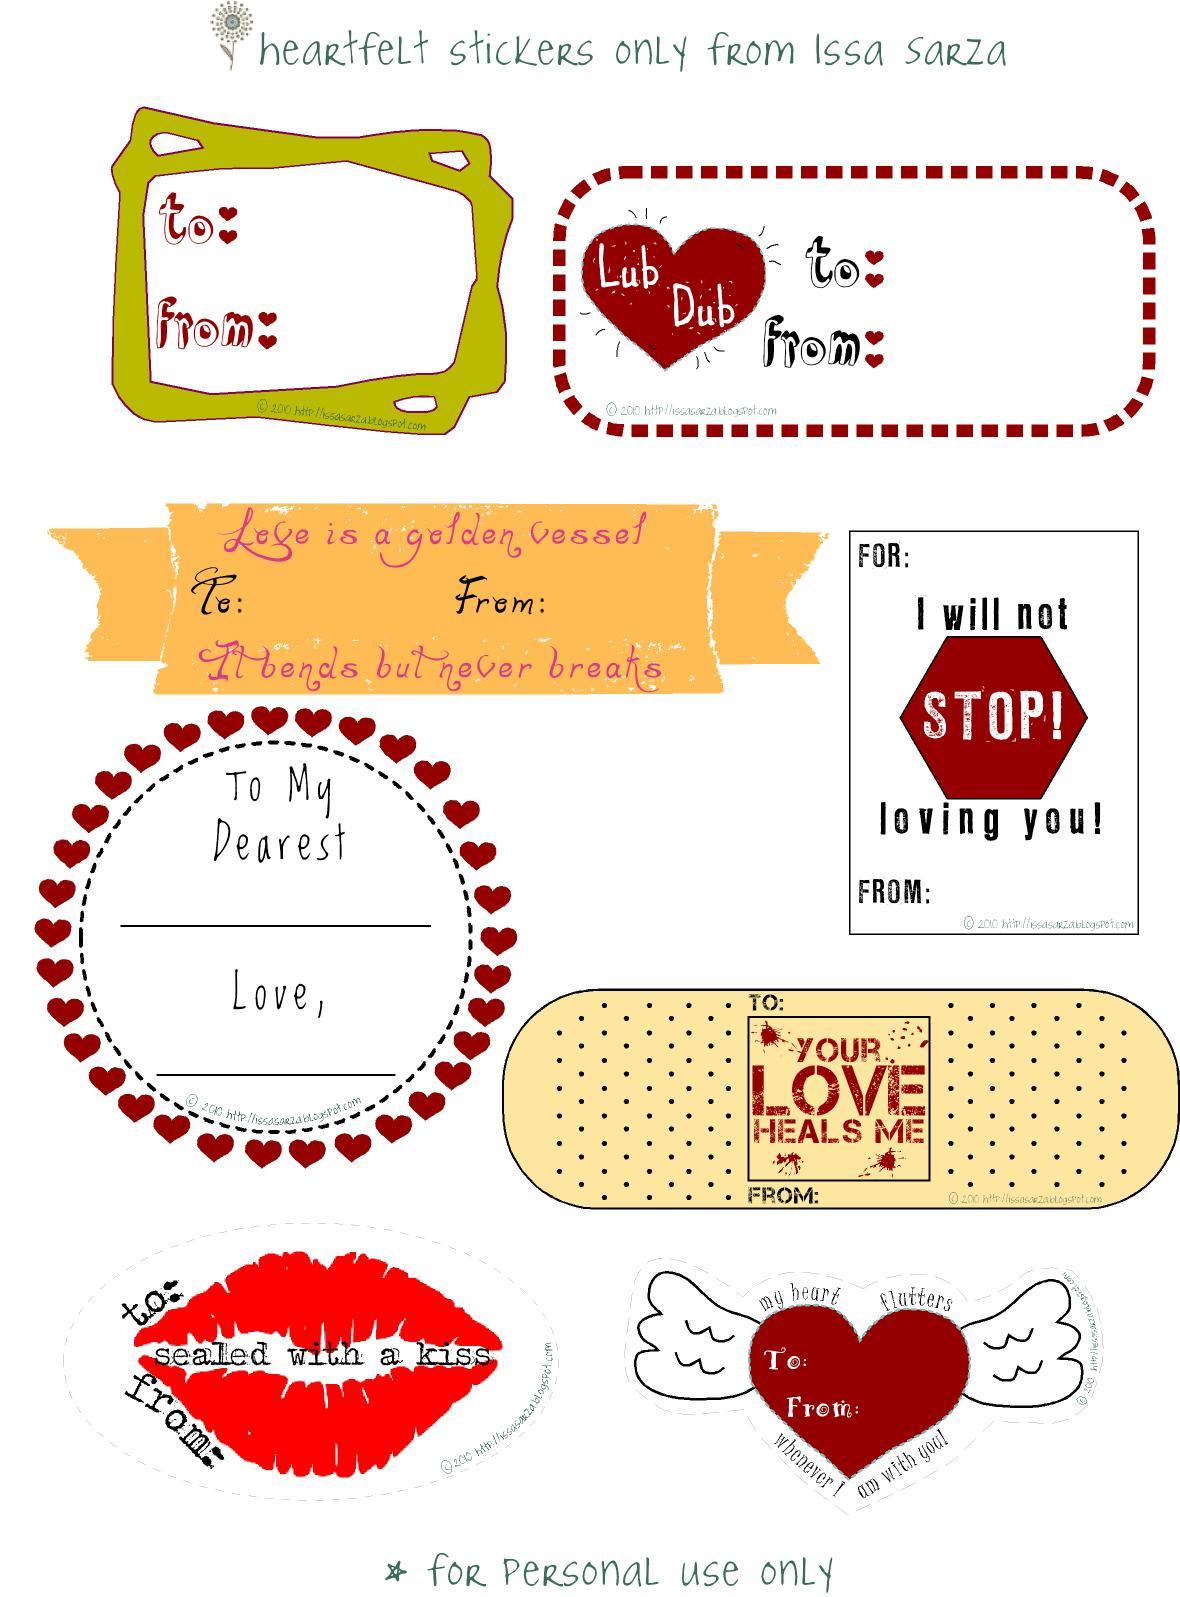 Imagenes De San Valentin Para Imprimir Gratis